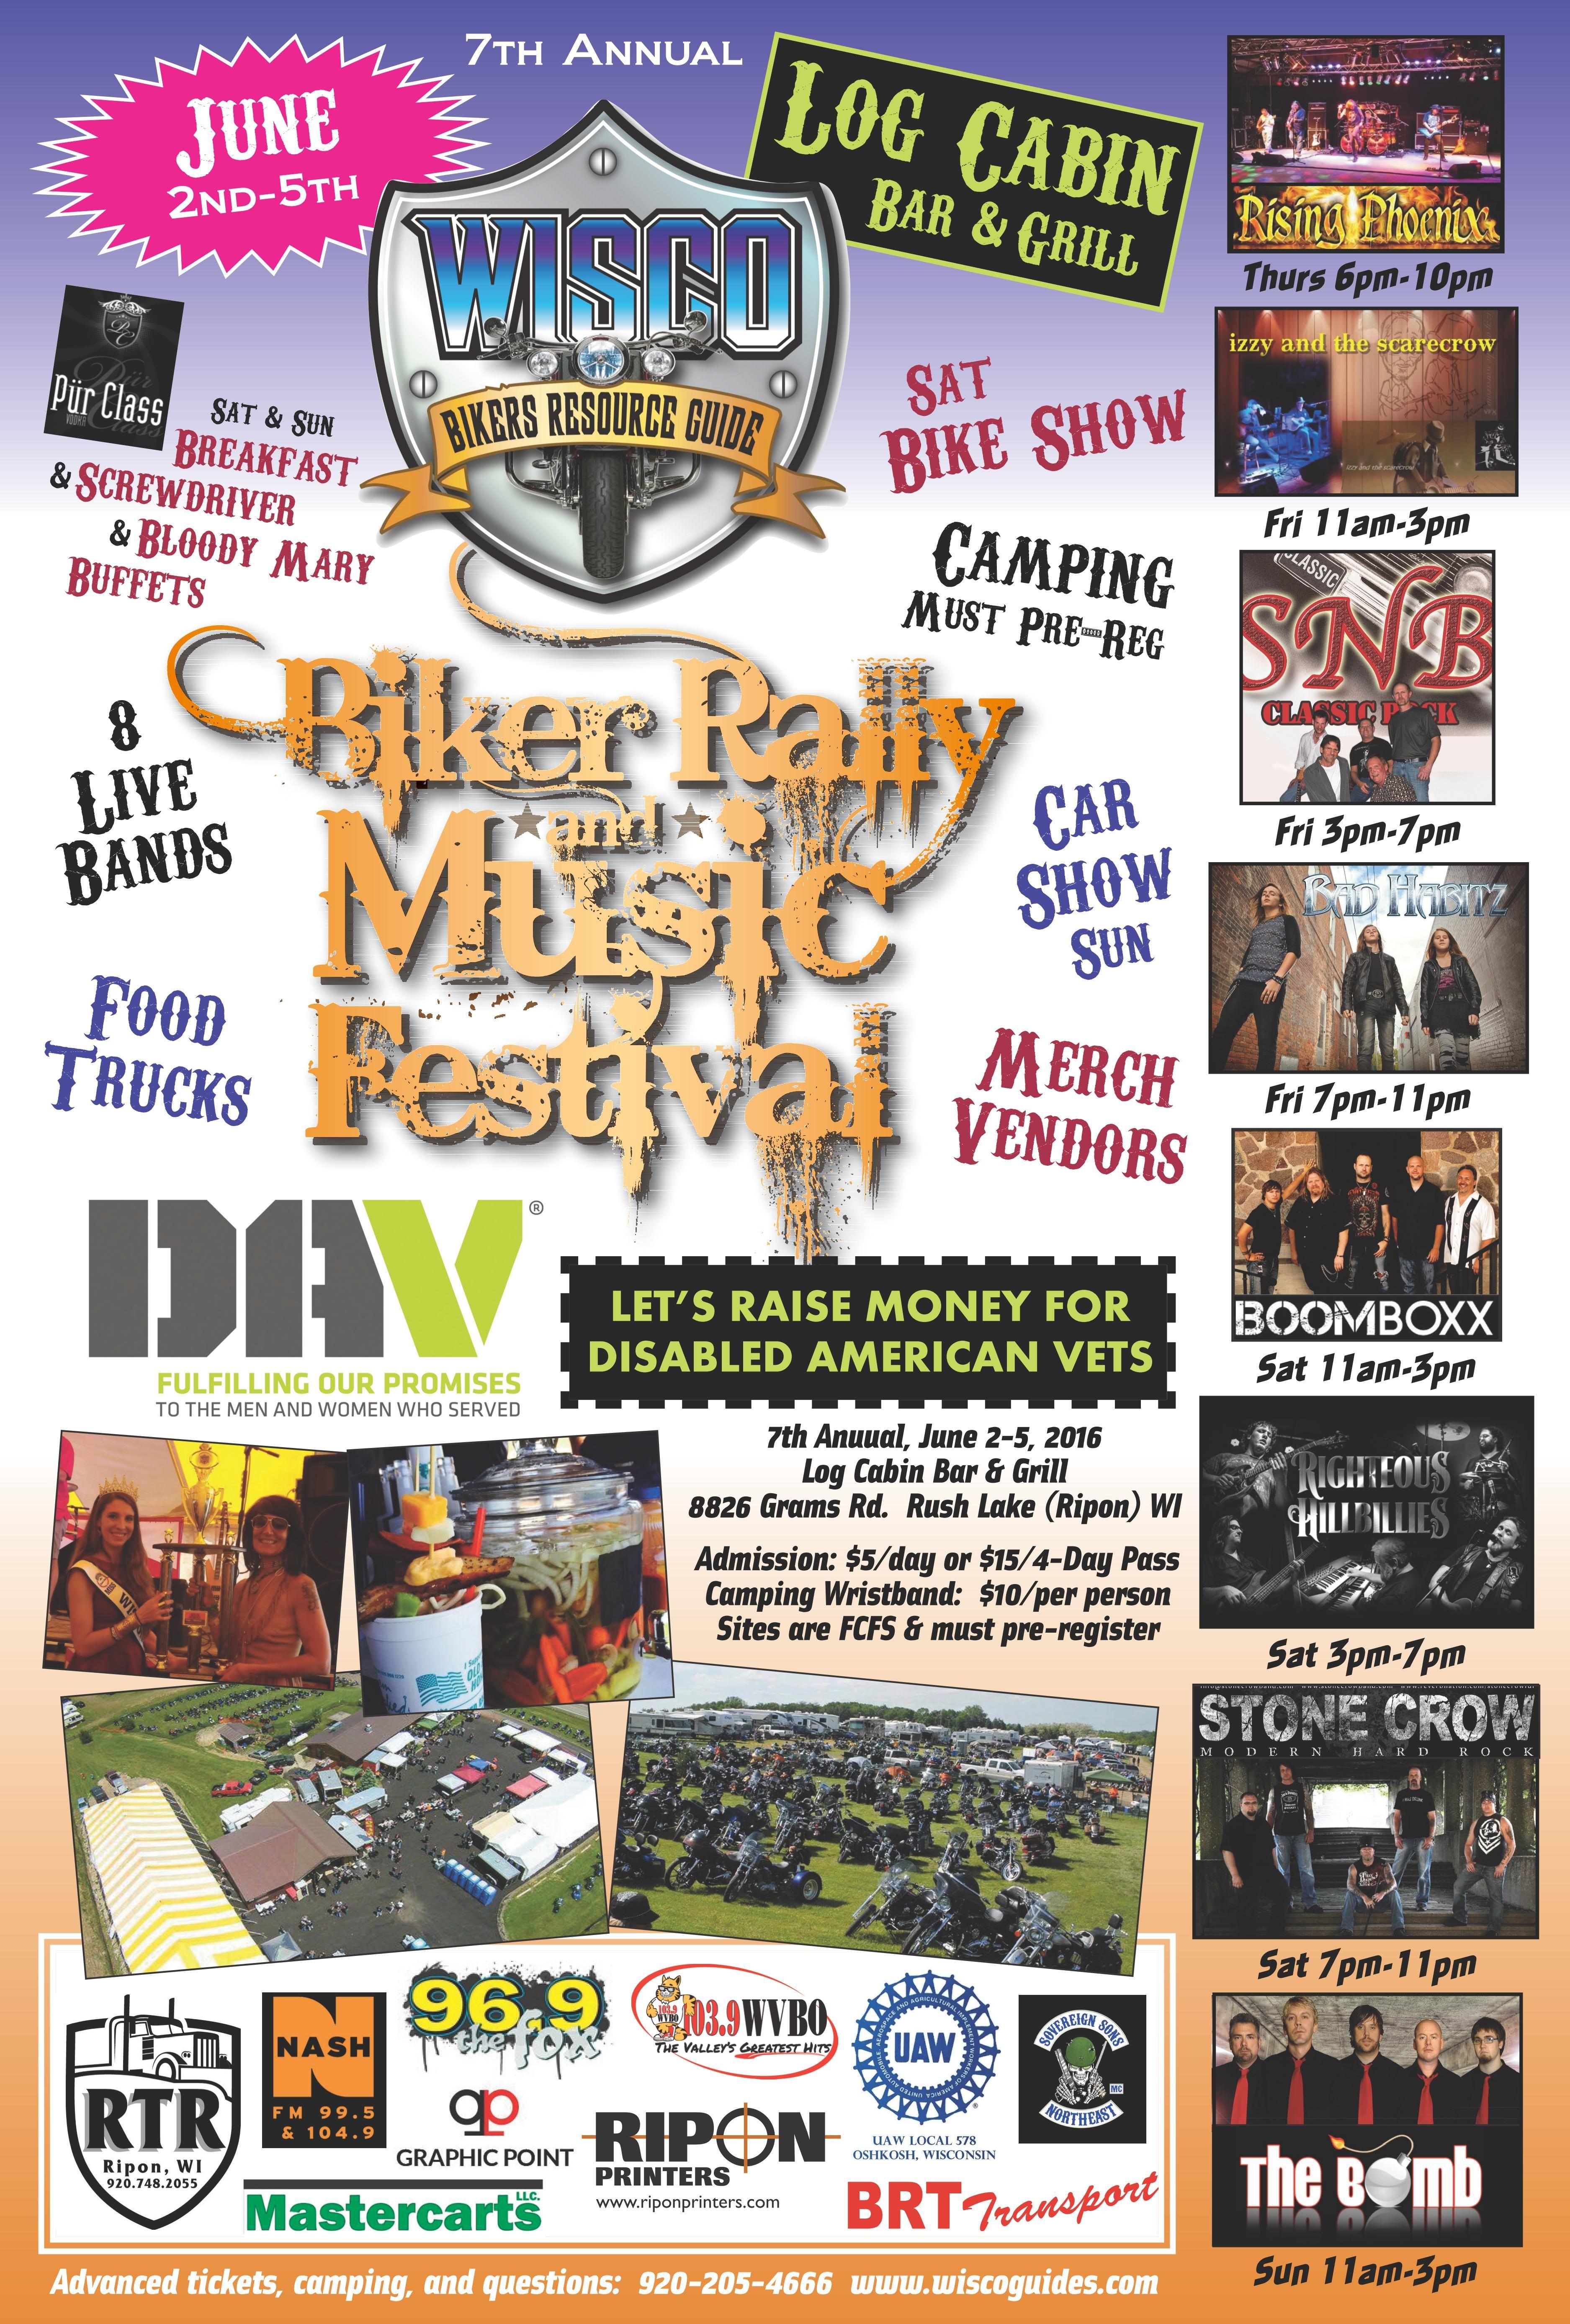 WISCO 7th Annual Biker Rally & Music Festival June 2nd5th